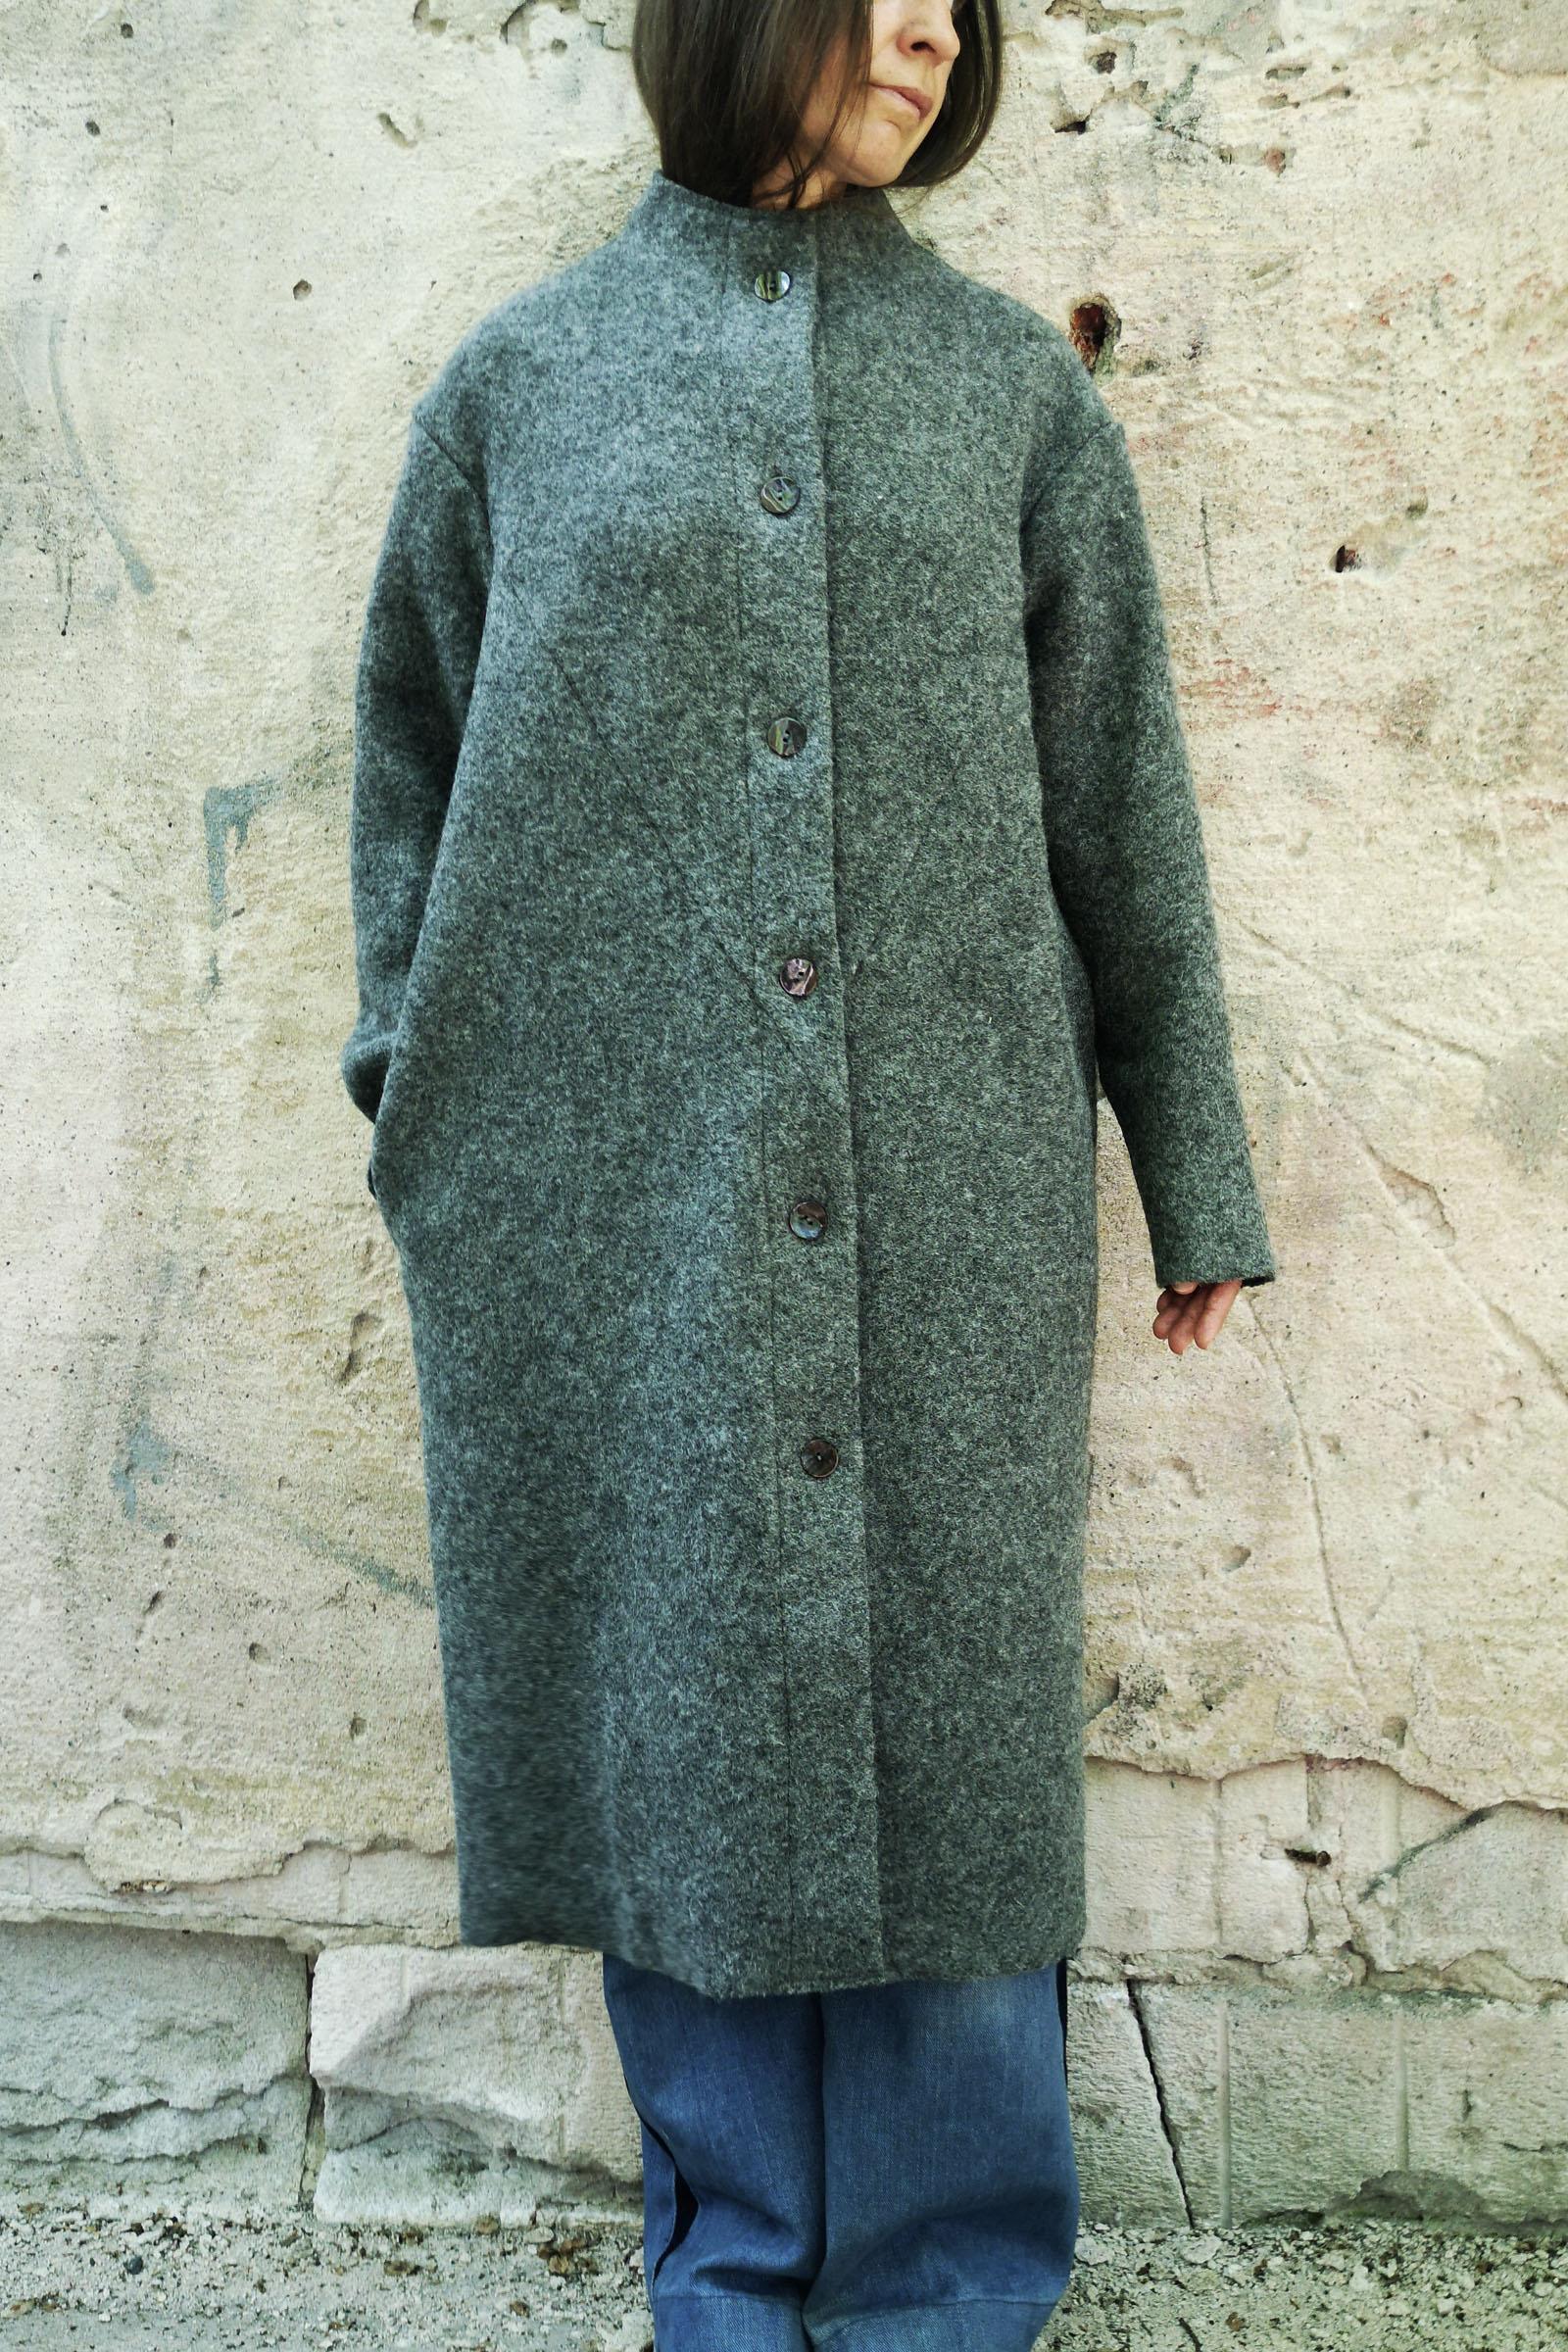 Maria-byman-woman-nelly-coat-plain1